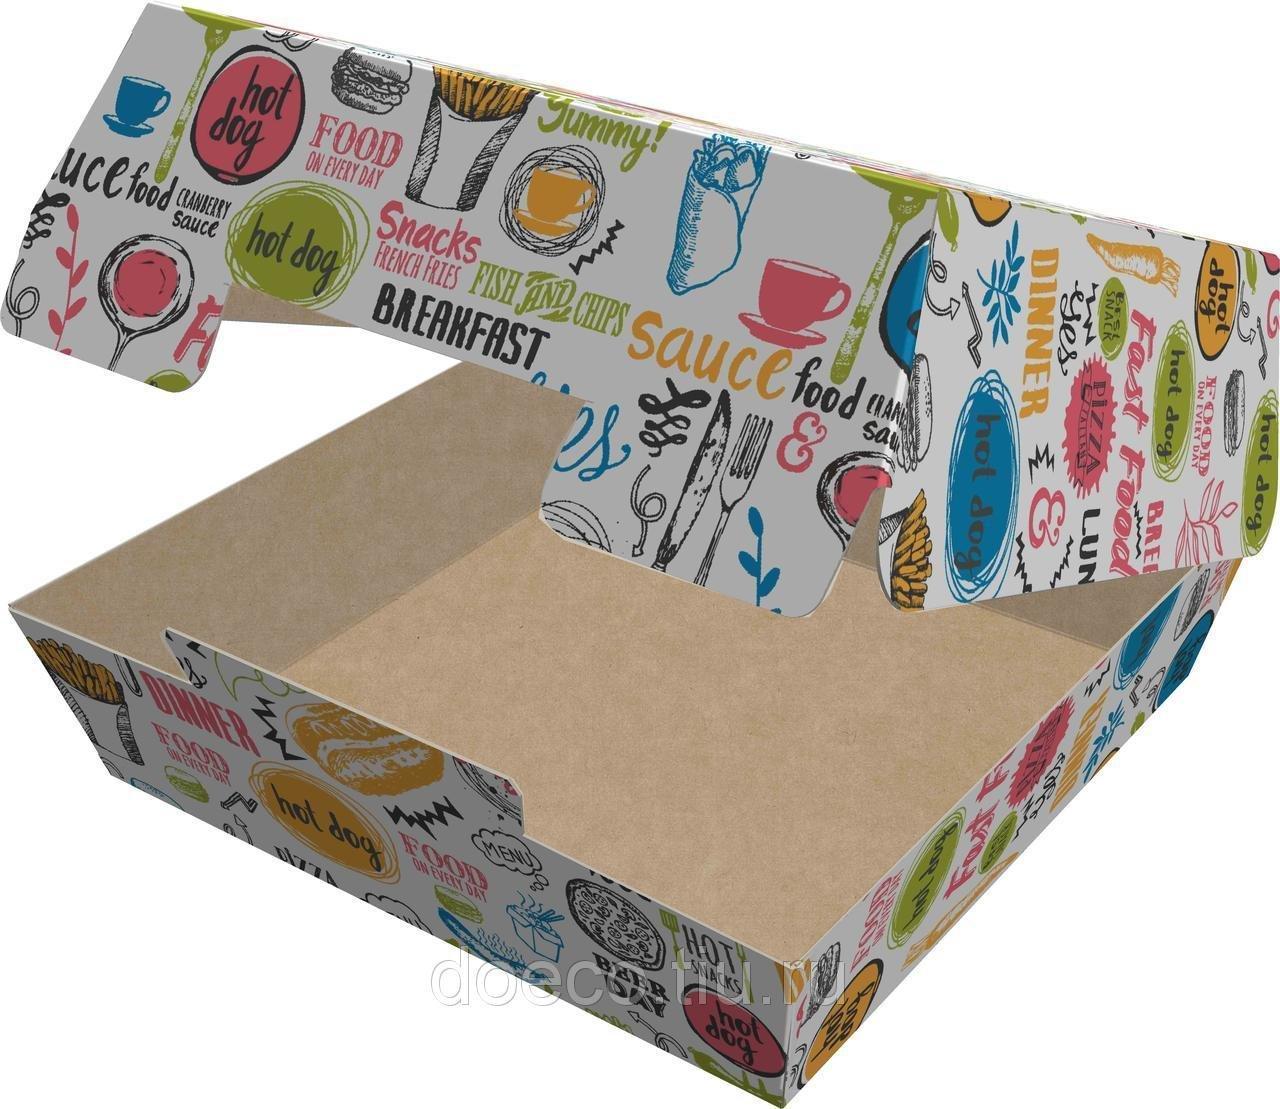 Коробка д/гамбургера, 100х100х60мм, ECO BURGER M ENJOY с печатью, картон, 150 шт